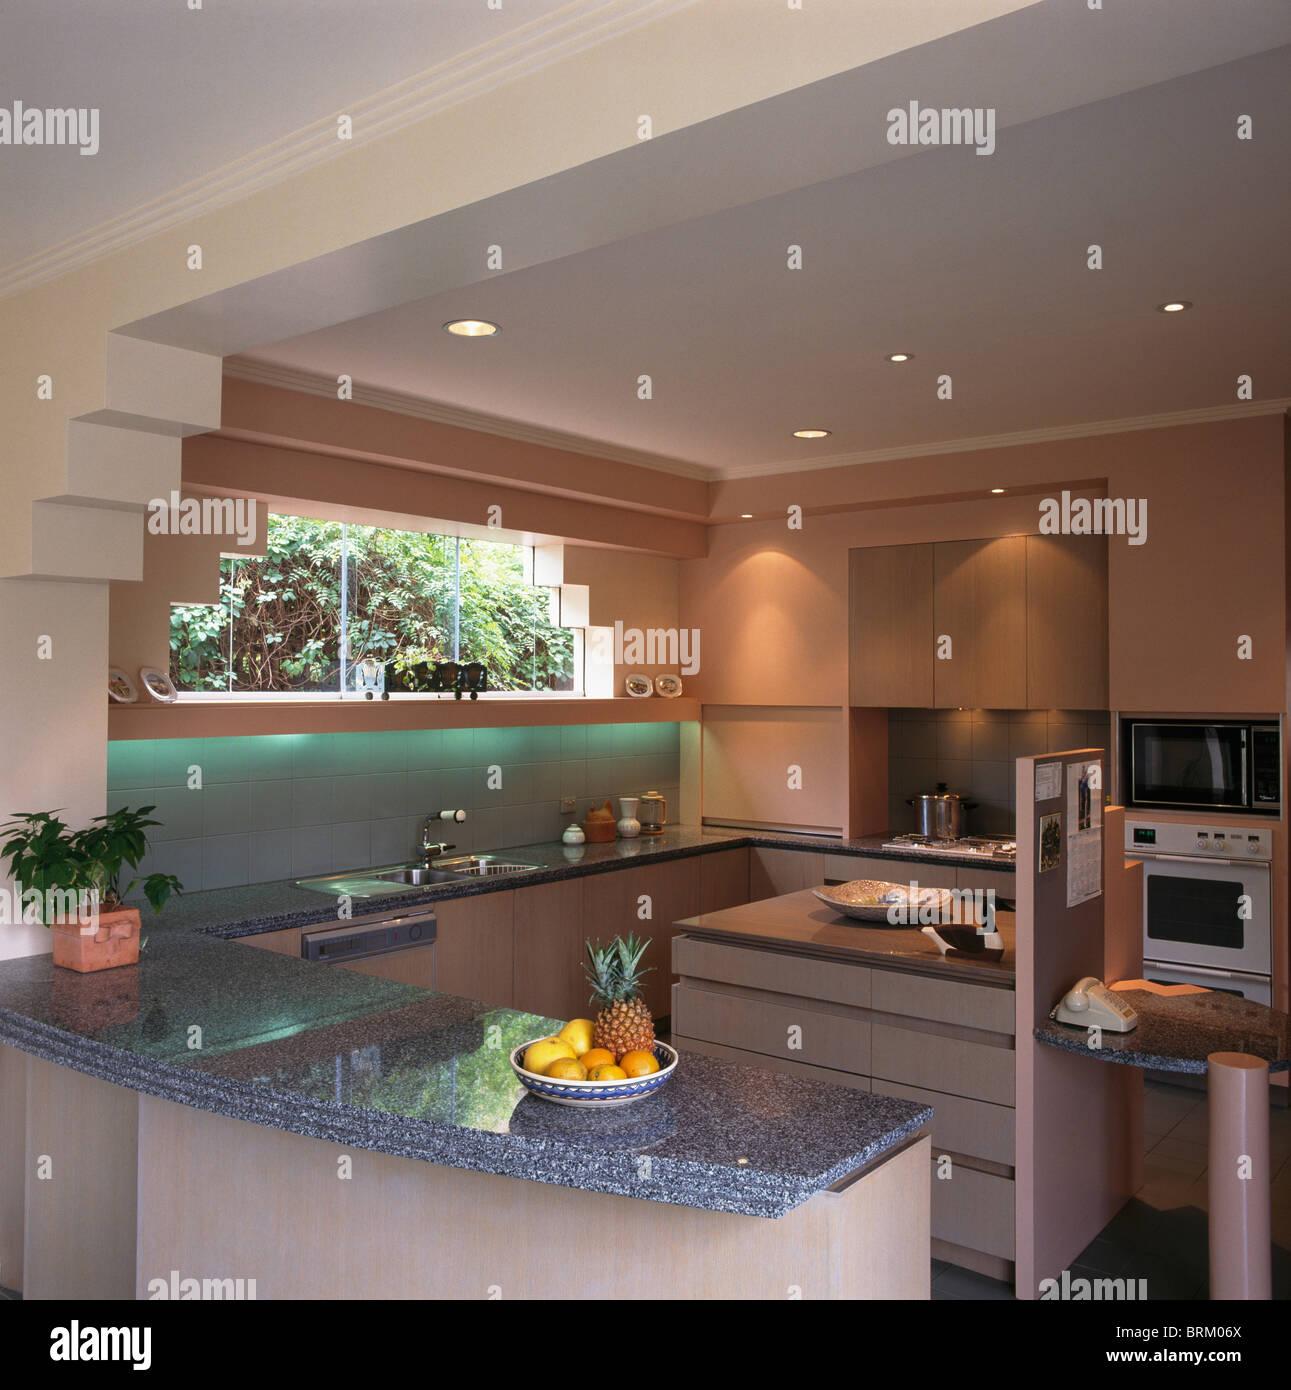 Kitchen Down Lighting. Pendant Kitchen Lighting Down - Brint.co on